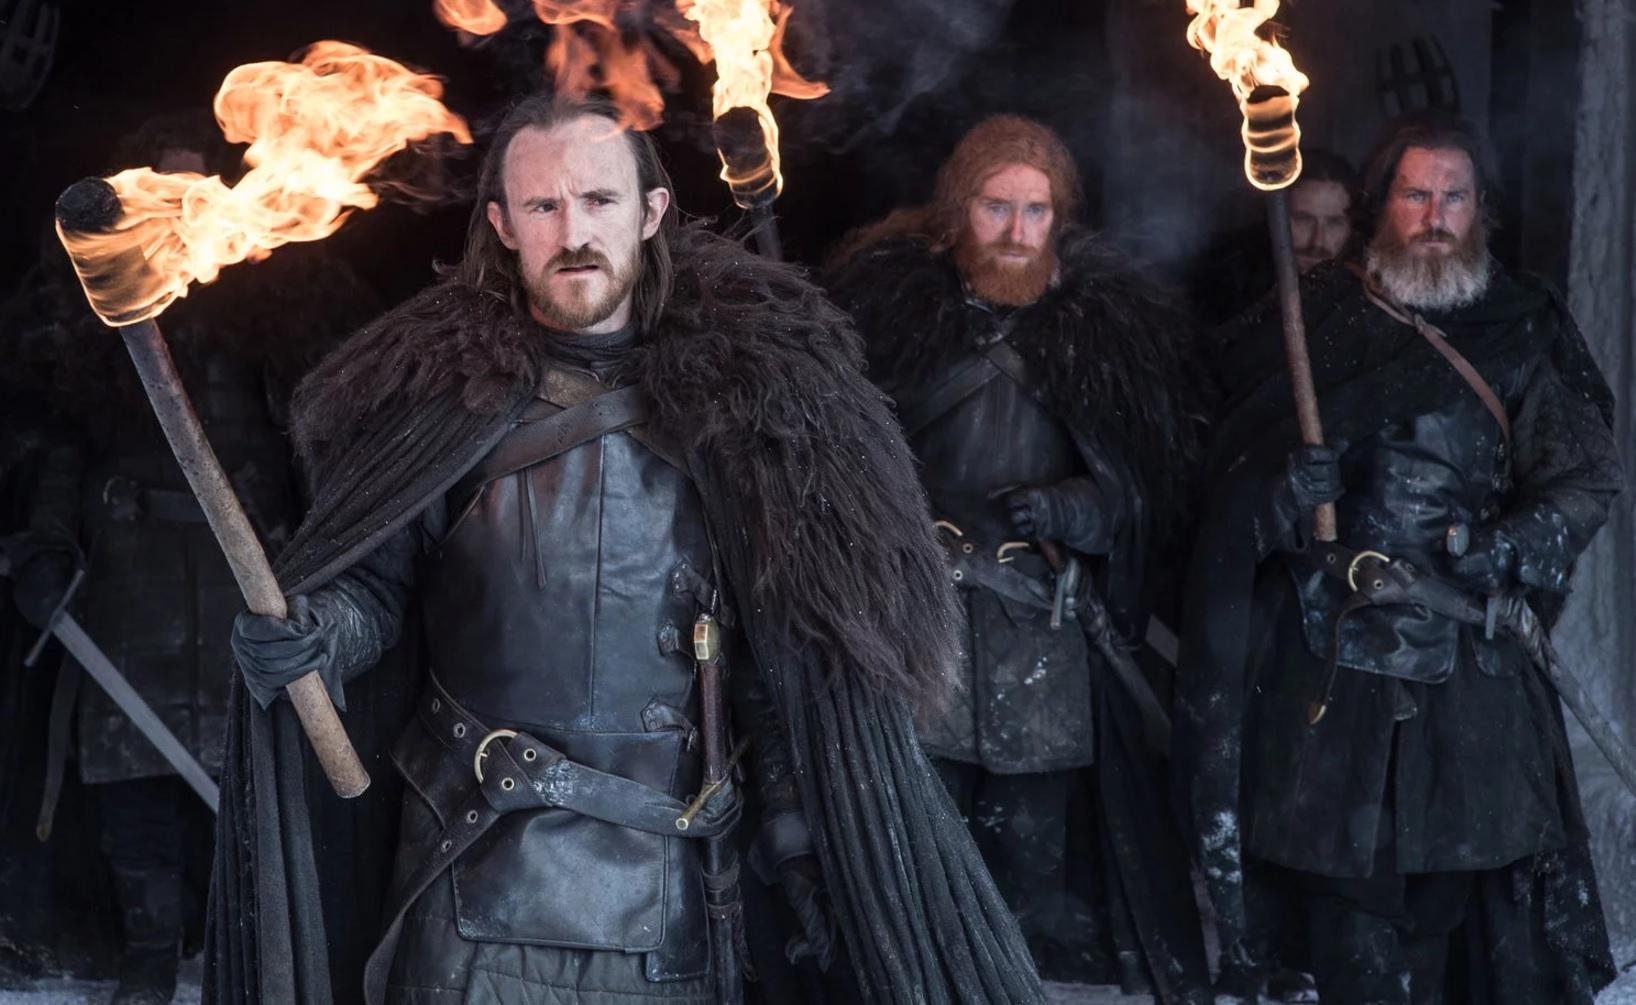 Game of Thrones setter stadig piratrekorder.